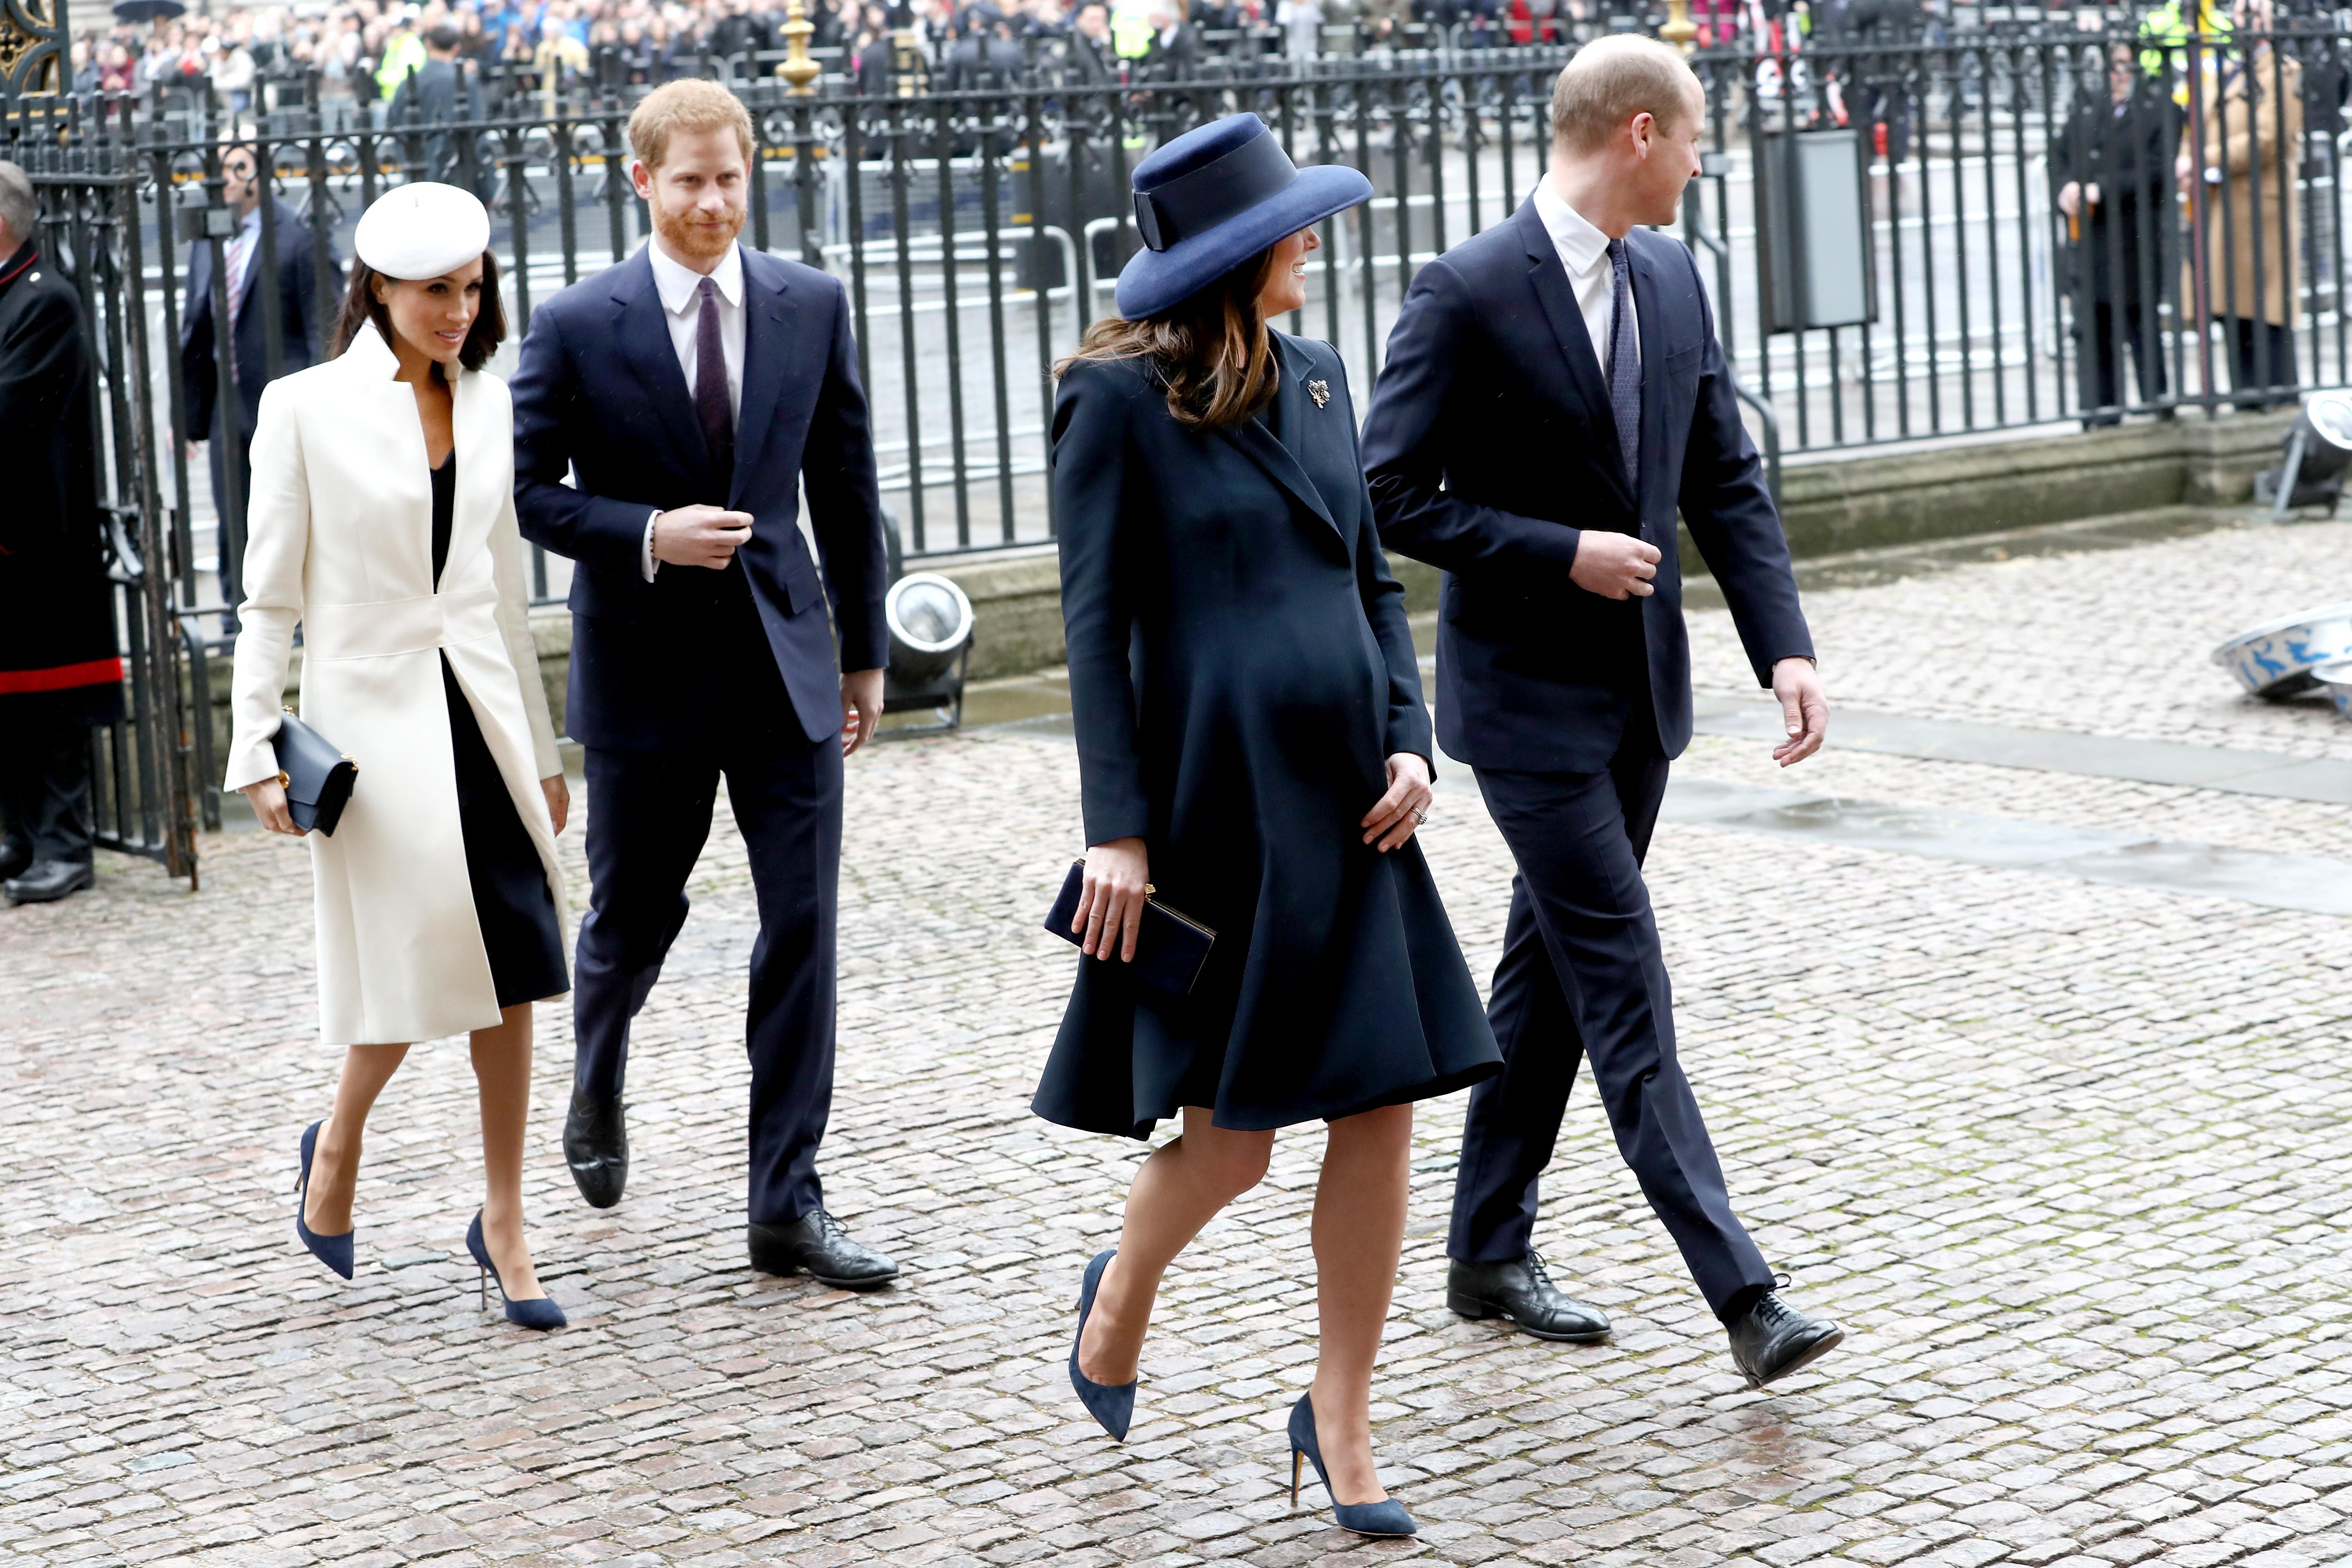 Kate Middleton e Meghan Markle costumam apostar em looks de cores sóbrias